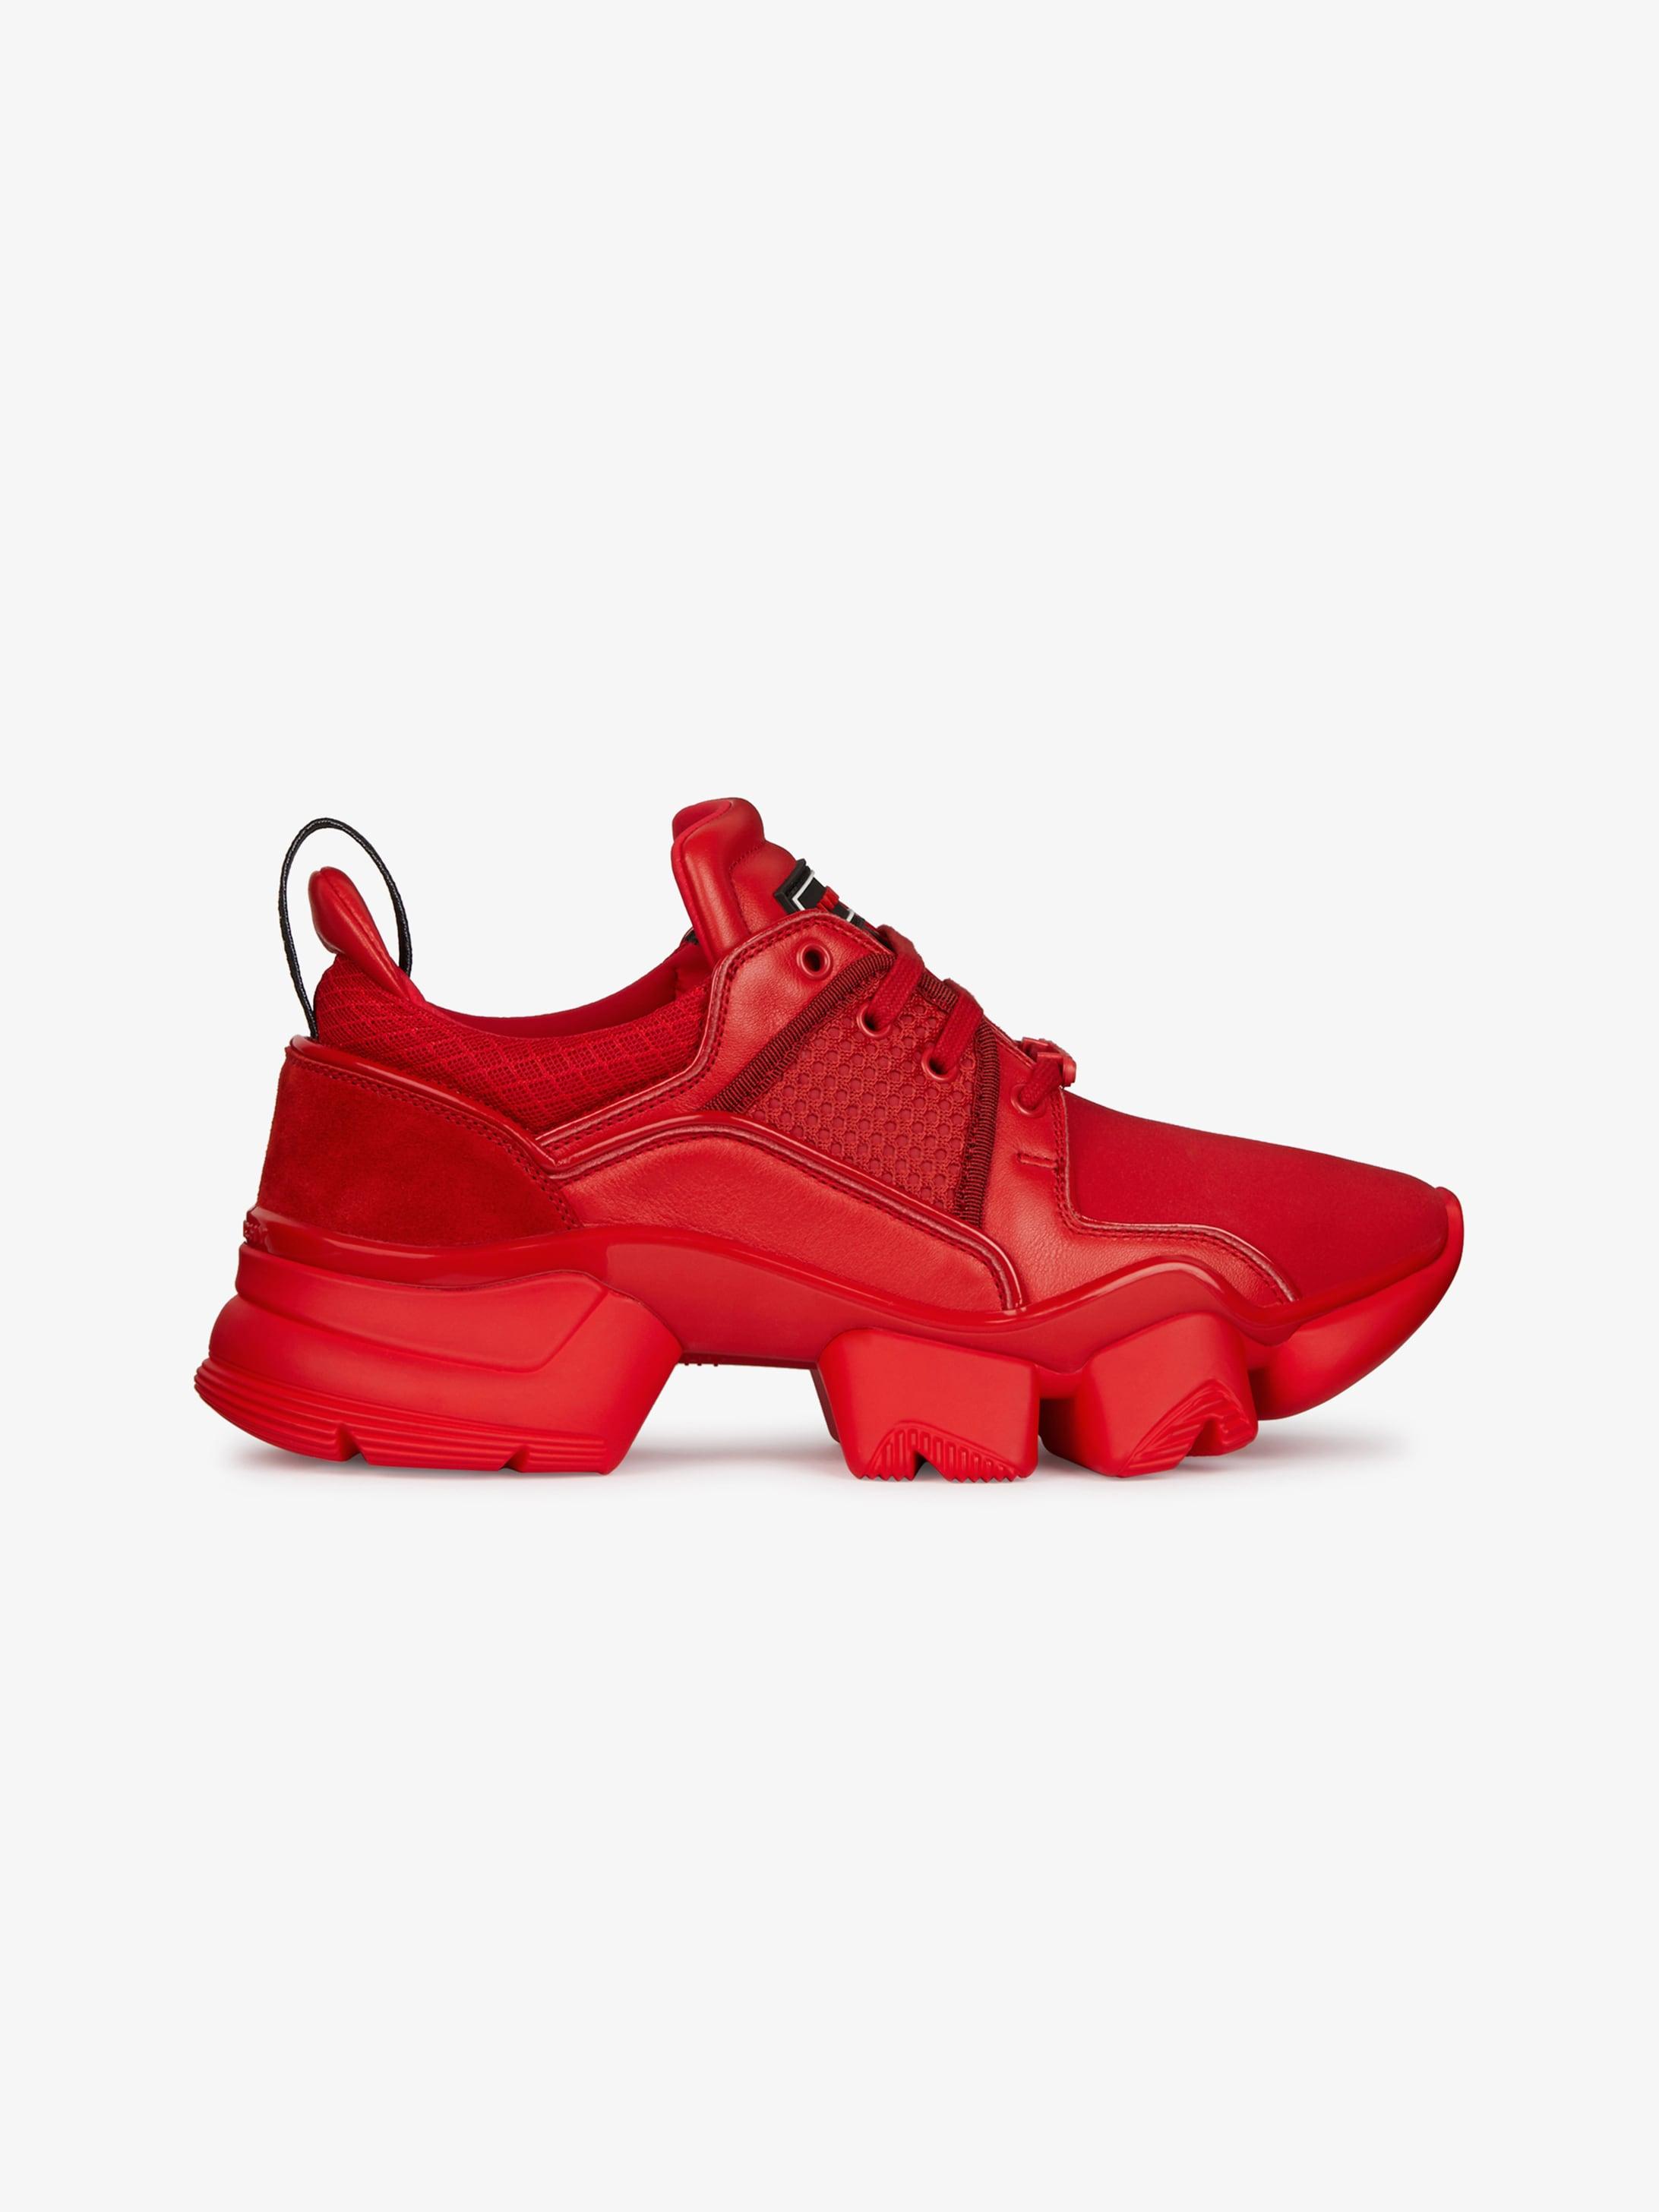 Jaw low sneakersinneoprene and leather